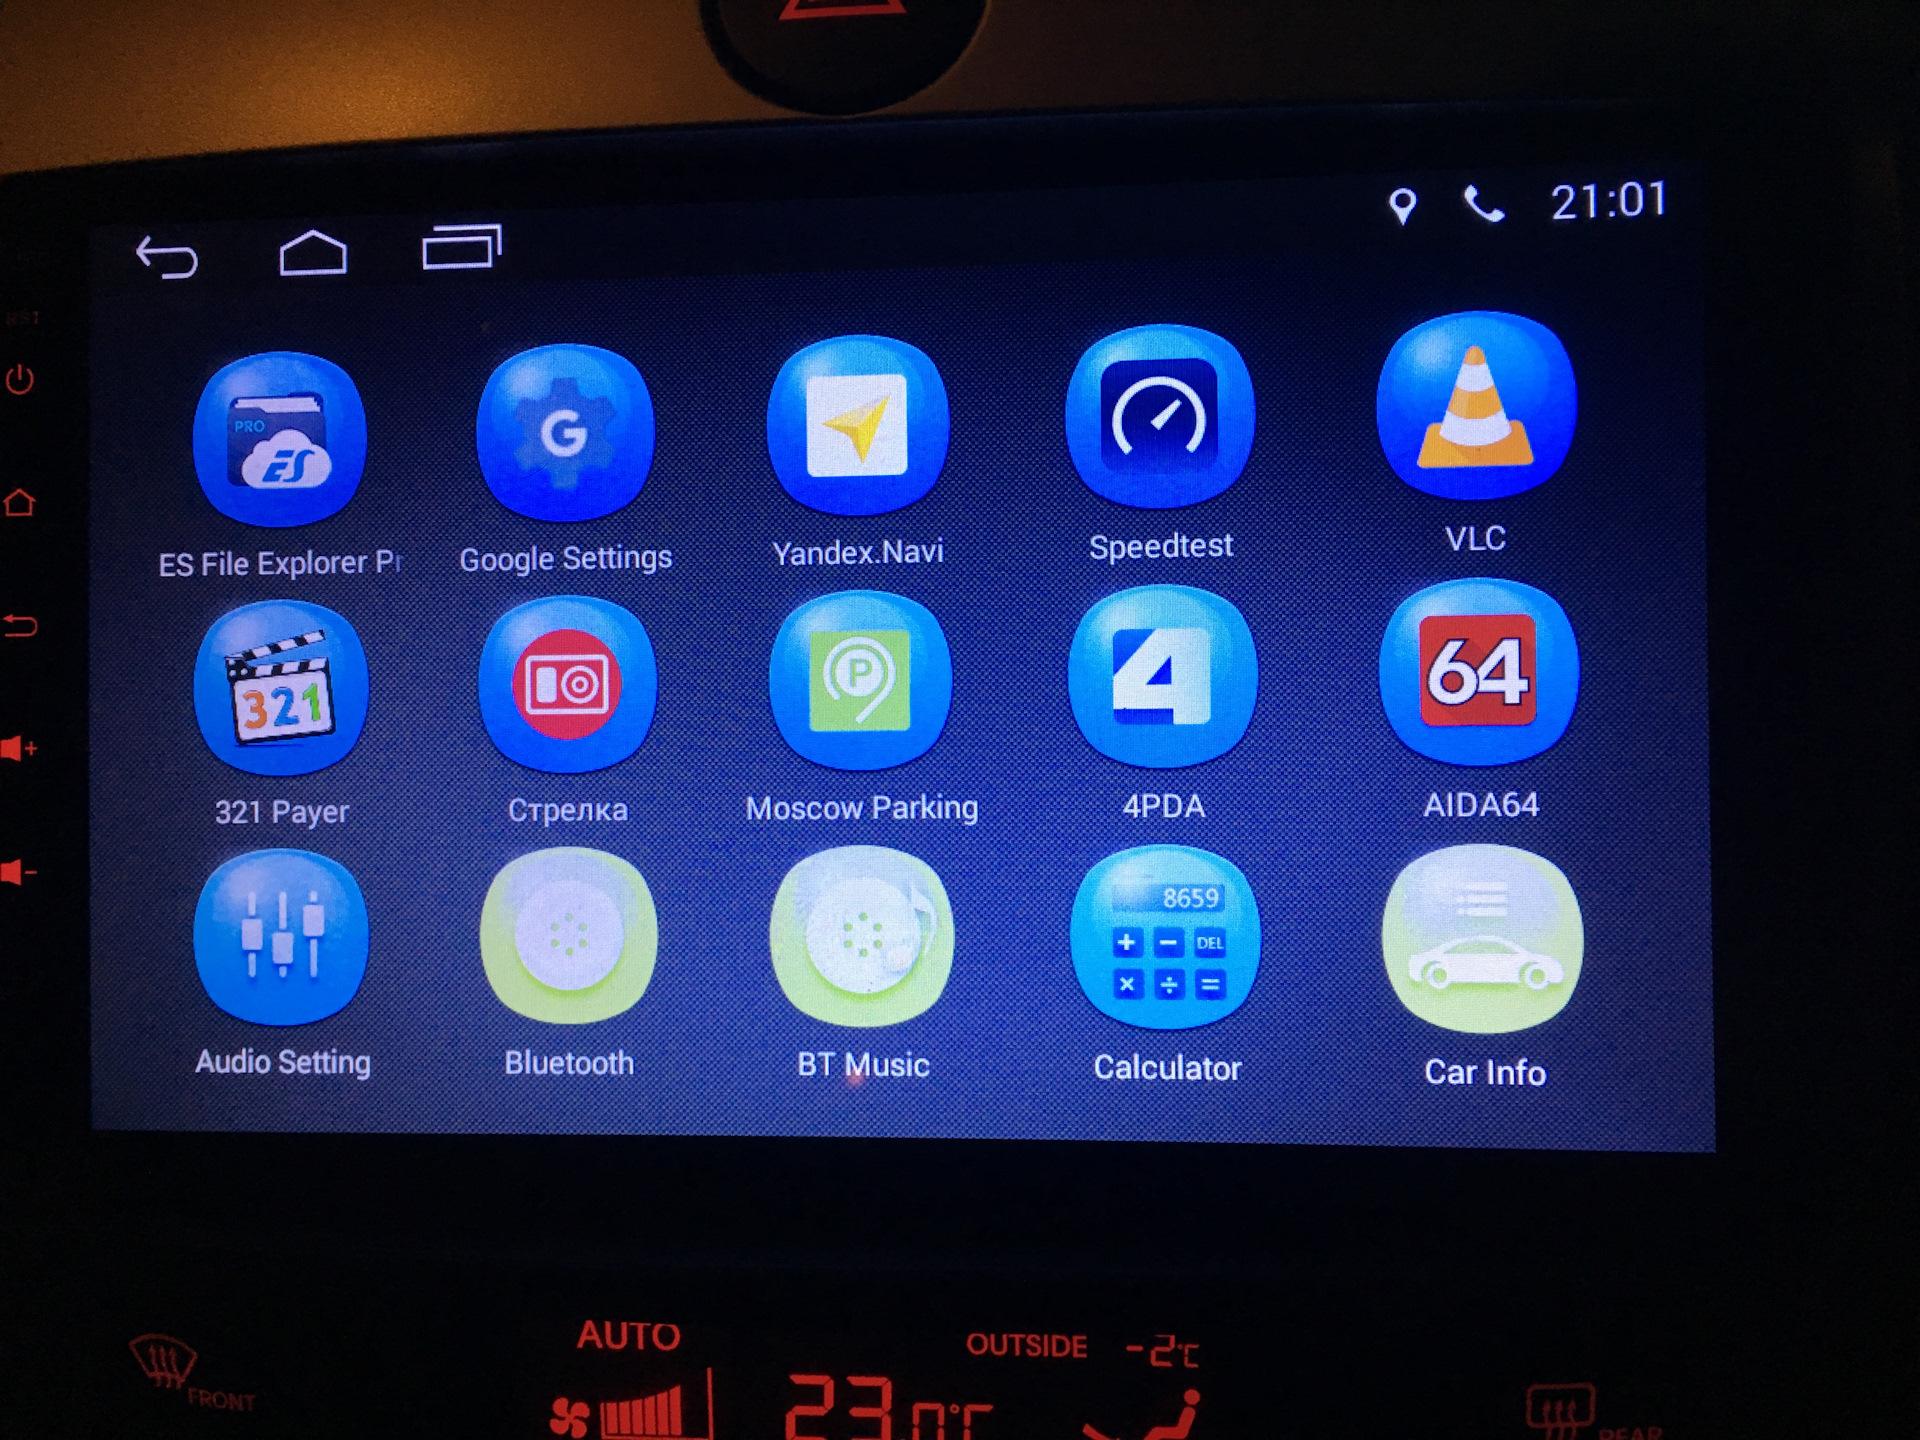 Установка ГУ Android Allwinner T3 Quad Core 1 2GHz (модель